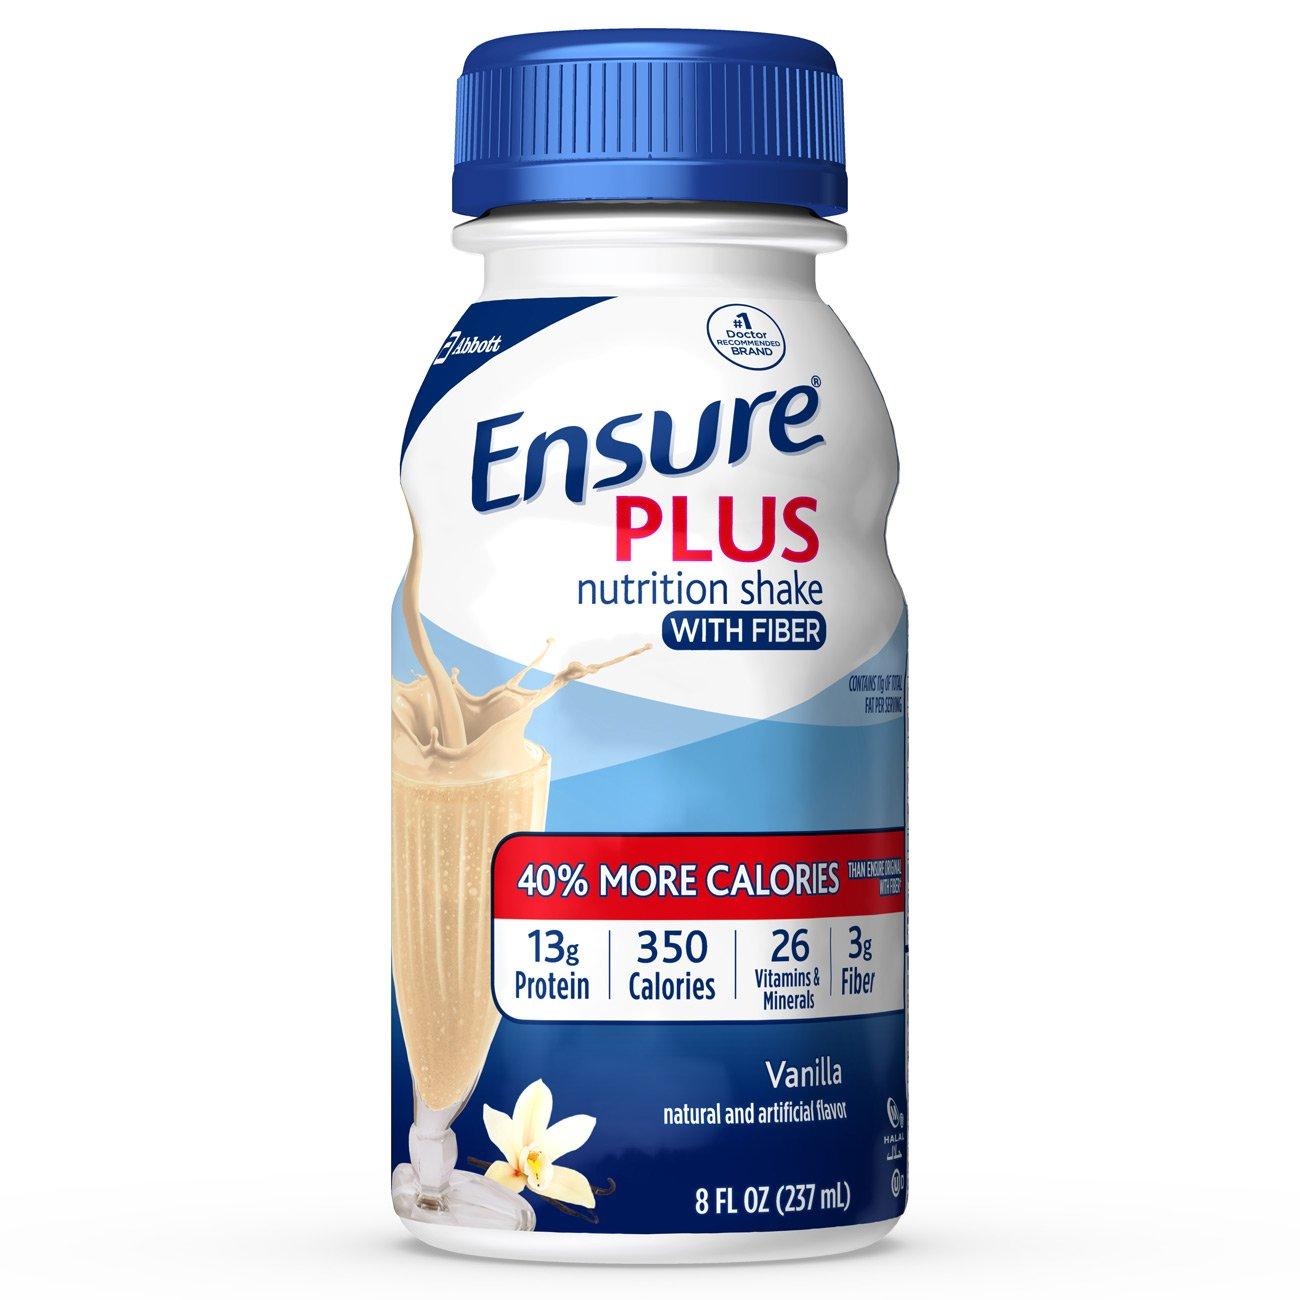 Ensure Plus Nutrition Shake With Fiber, Vanilla, 24 Count